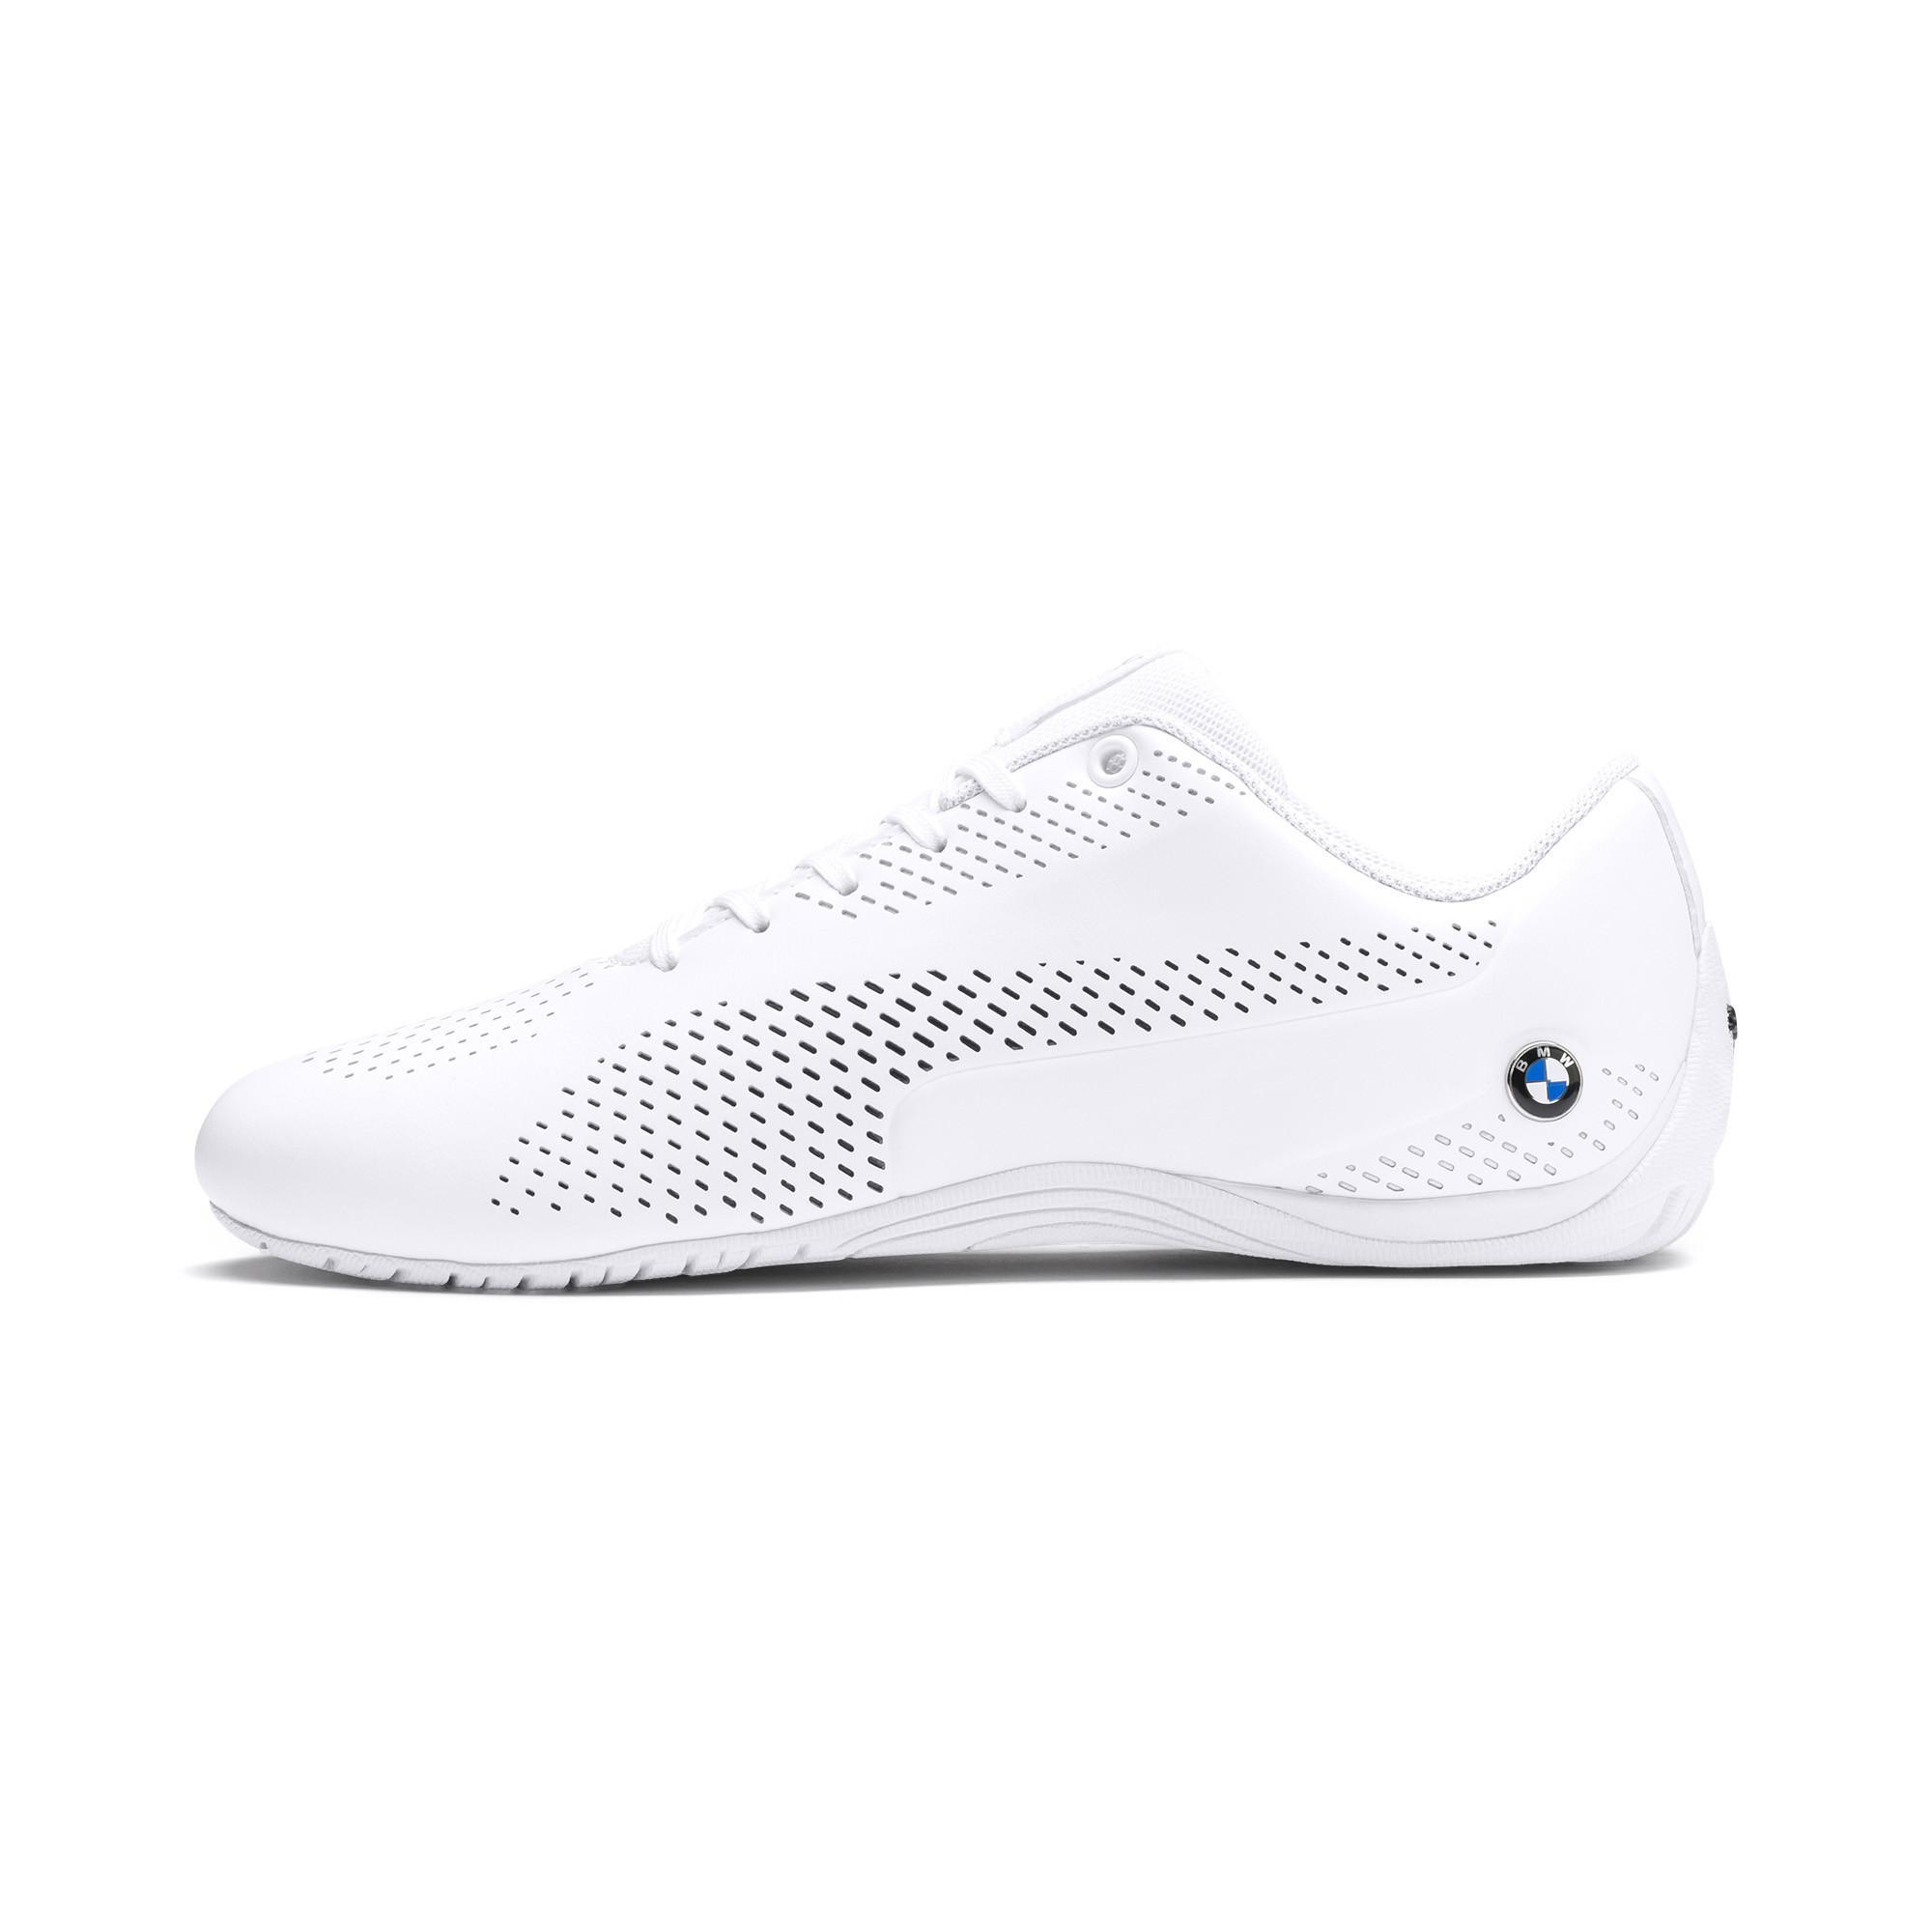 448ecfcef86 Lyst - PUMA Bmw Mms Drift Cat 5 Ultra Ii Men s Sneakers in White for Men